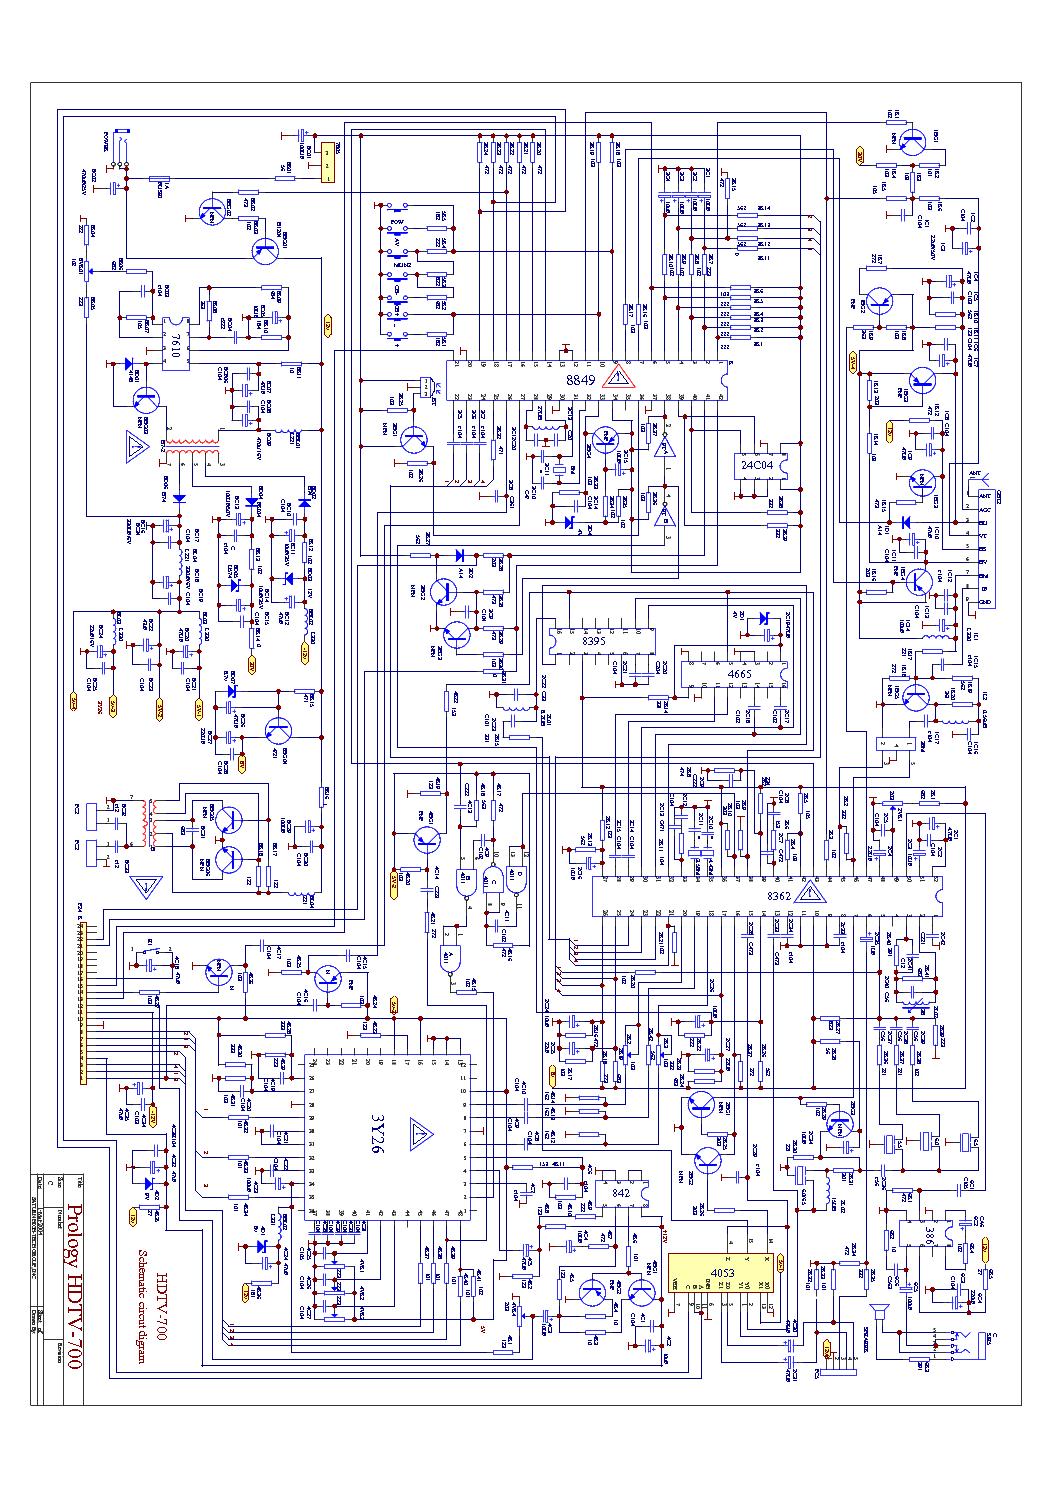 Prology hdtv-909s схема